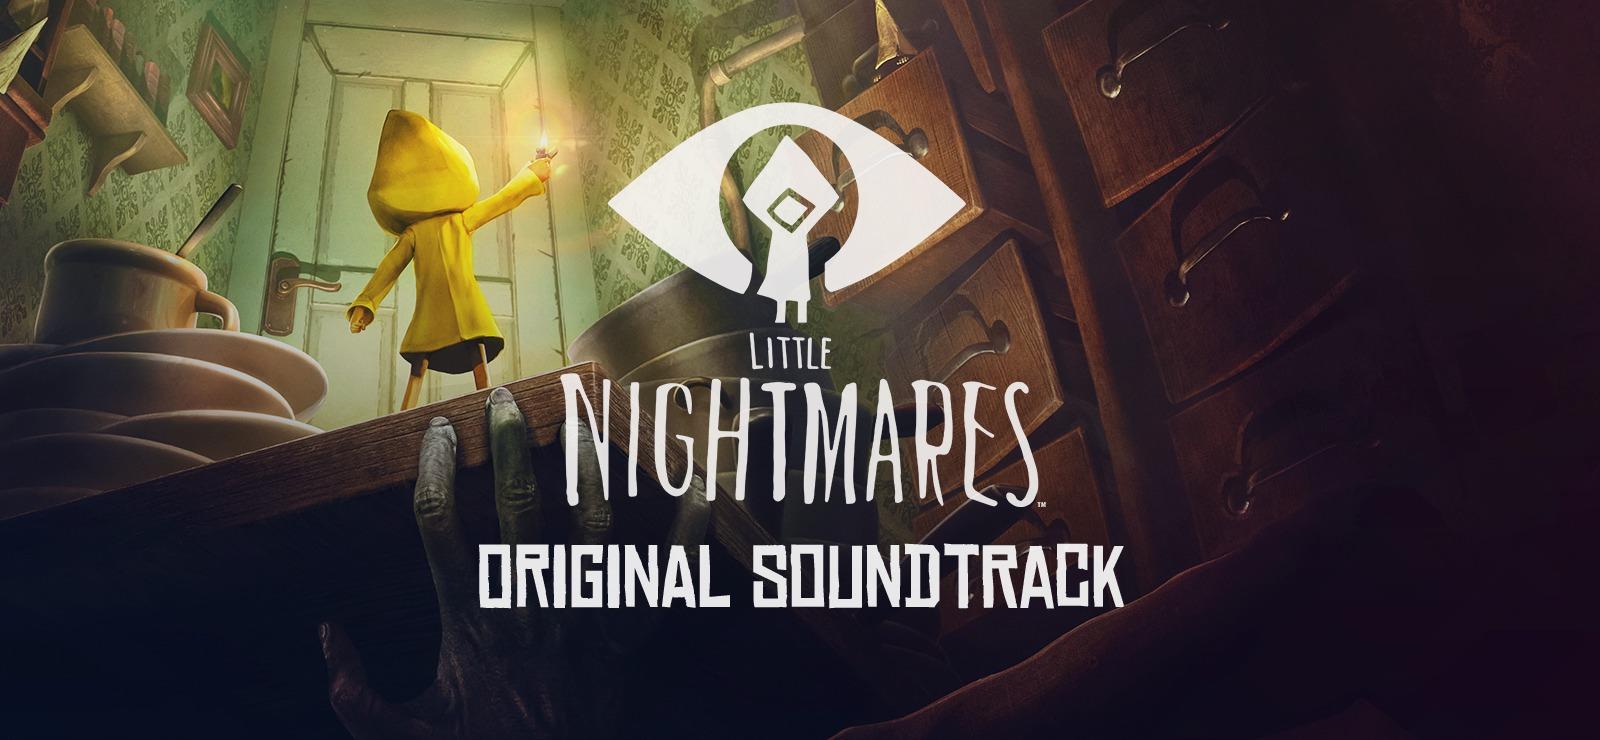 Little Nightmares Soundtrack